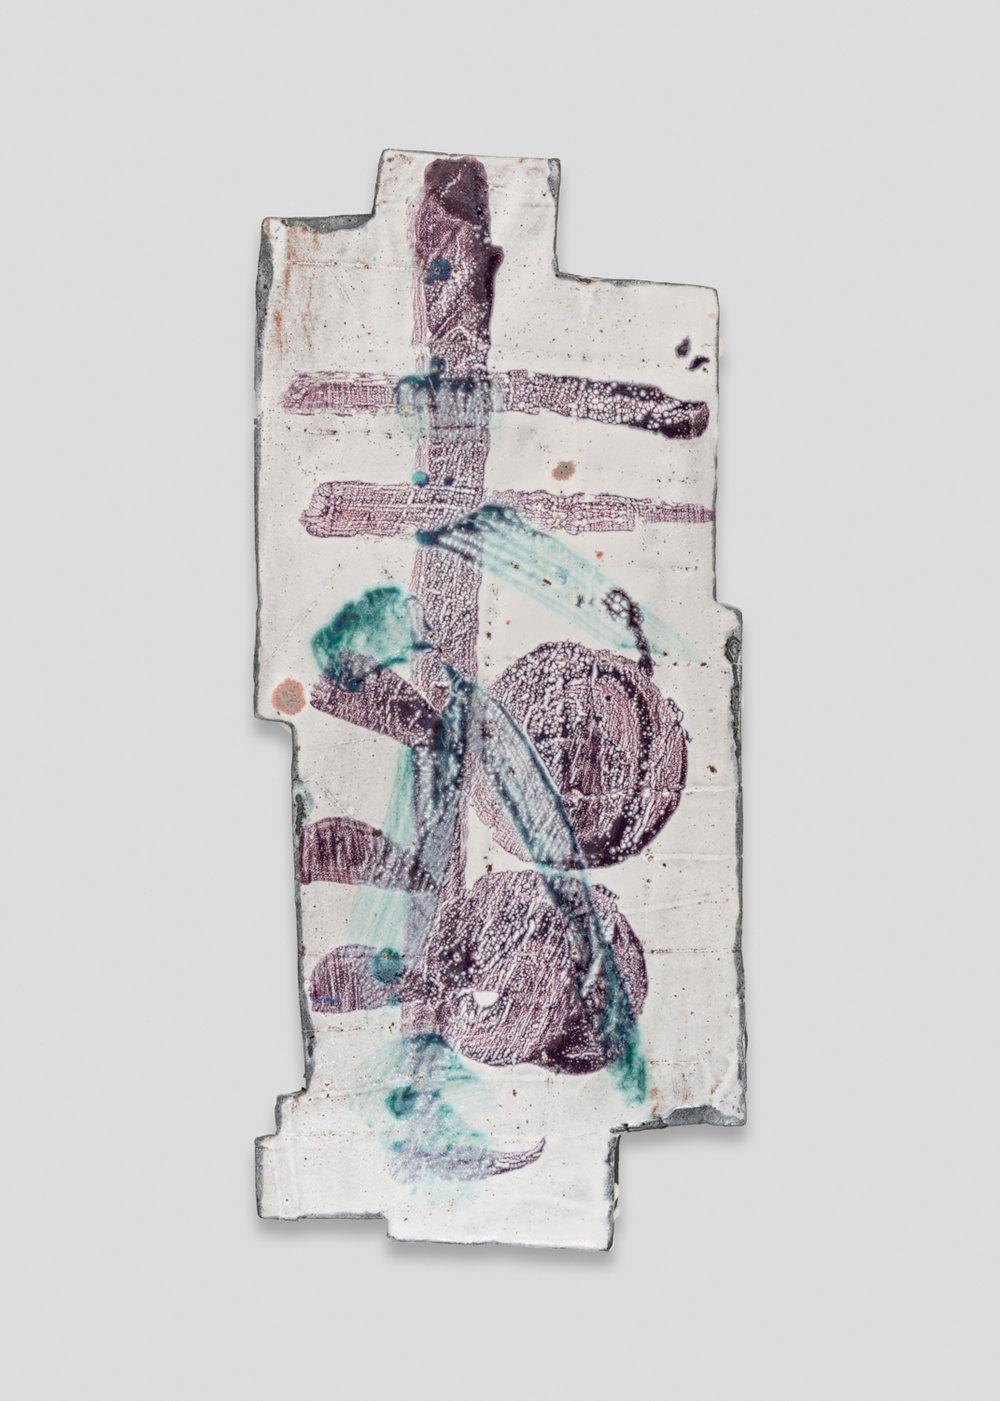 William J.O'Brien  Untitled  2017 Glazed ceramic 20h x 9w x 2d in WOB1233